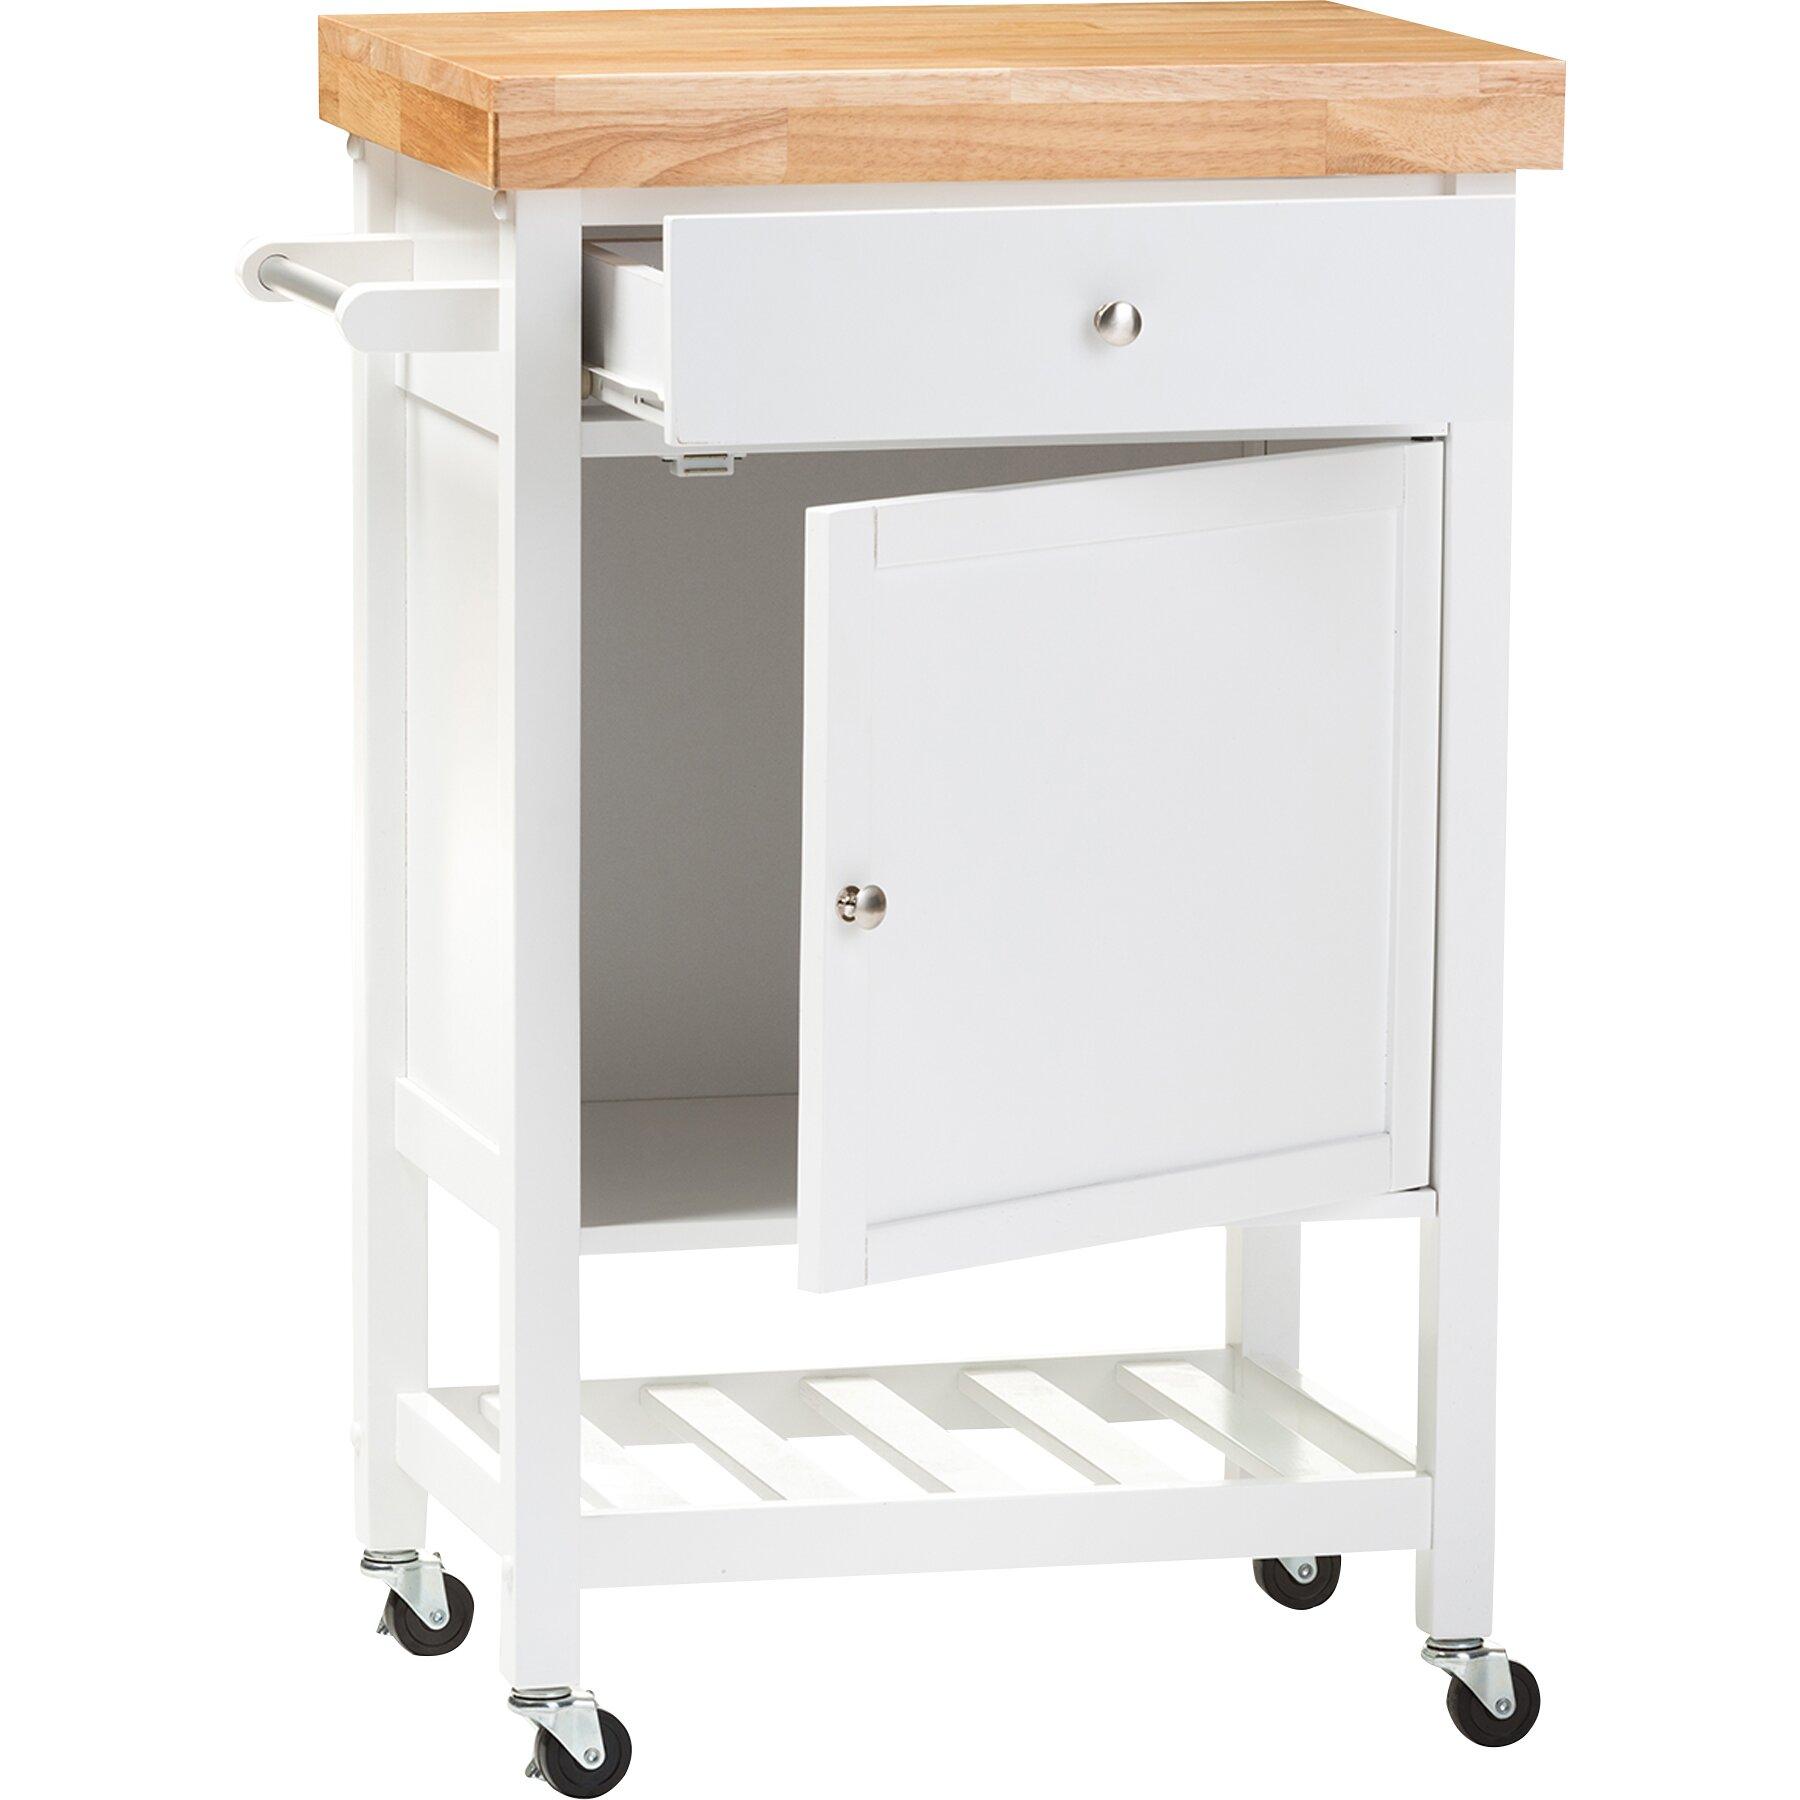 Wholesale Interiors Baxton Studio Kitchen Cart With Wood Top Reviews Wayfair